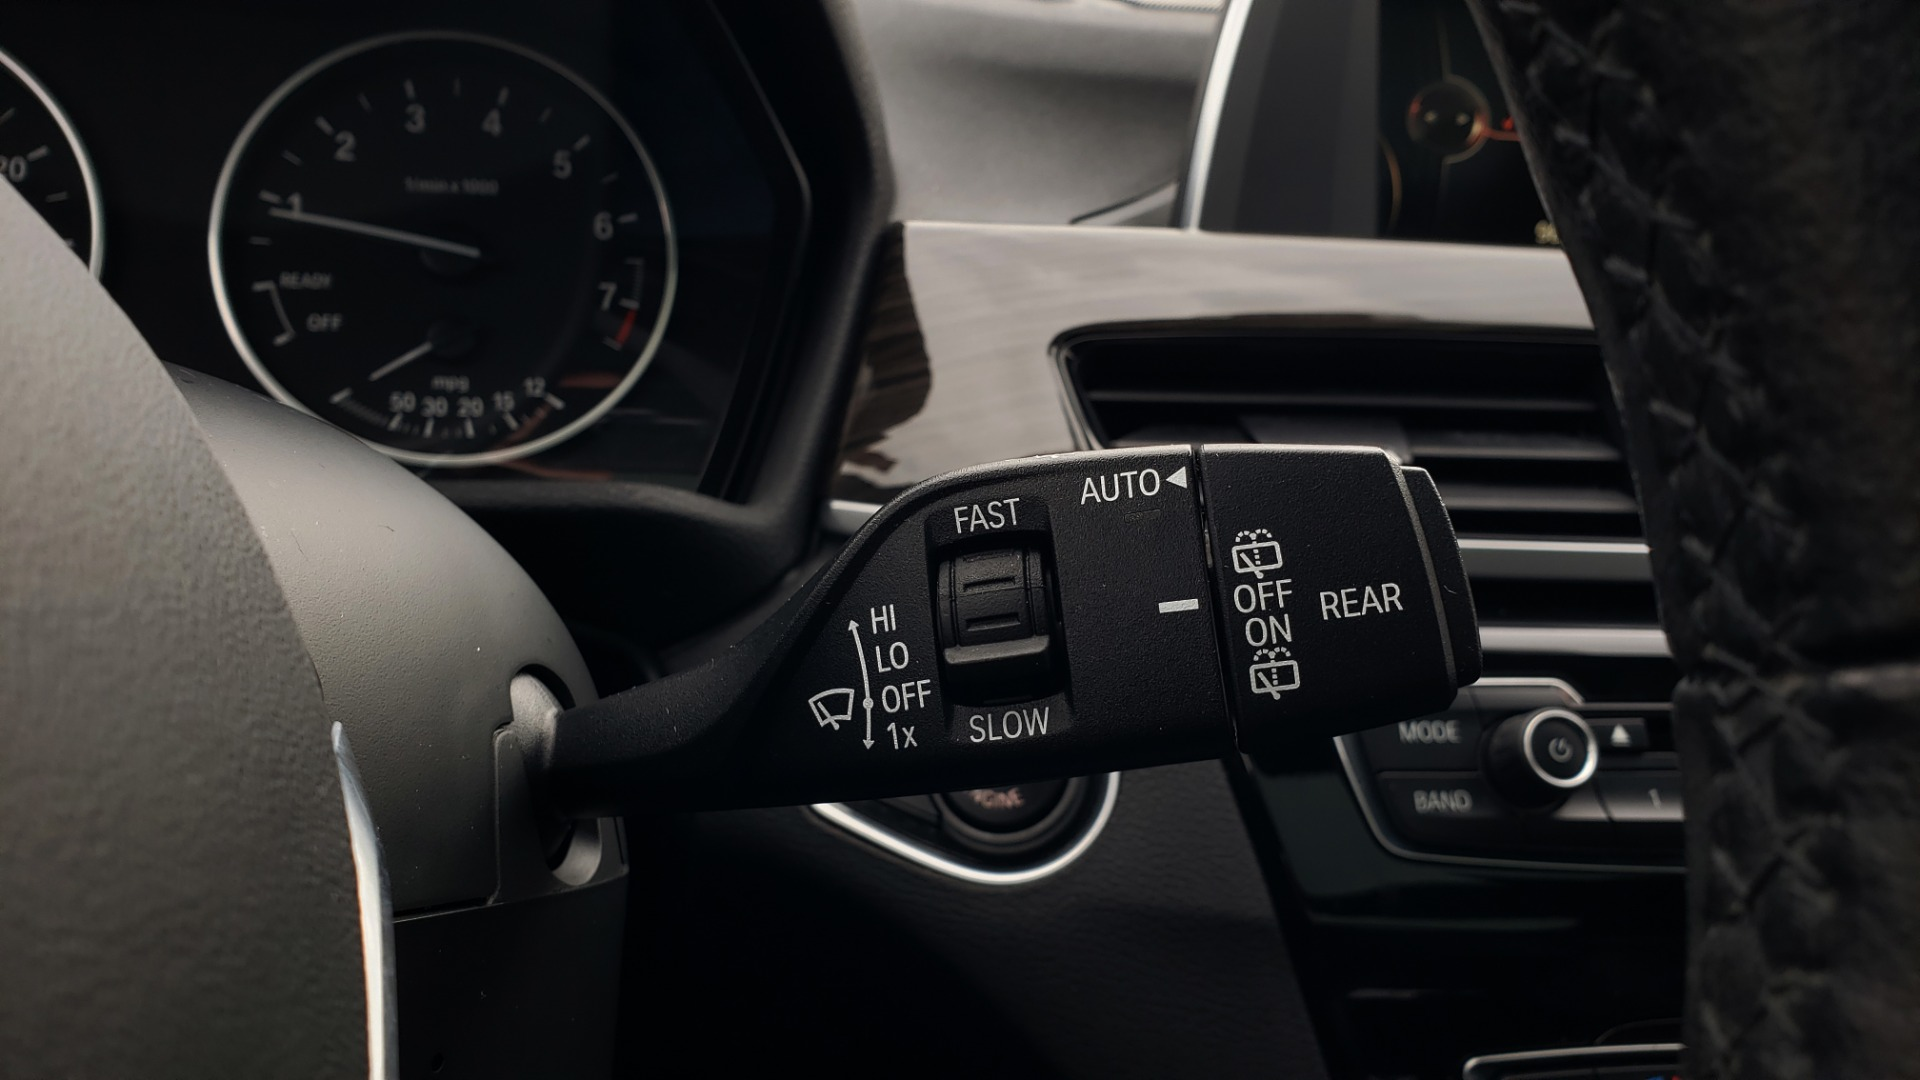 Used 2017 BMW X1 XDRIVE28I / PREM PKG / DRIVER ASST / NAV / CLD WTHR for sale Sold at Formula Imports in Charlotte NC 28227 45